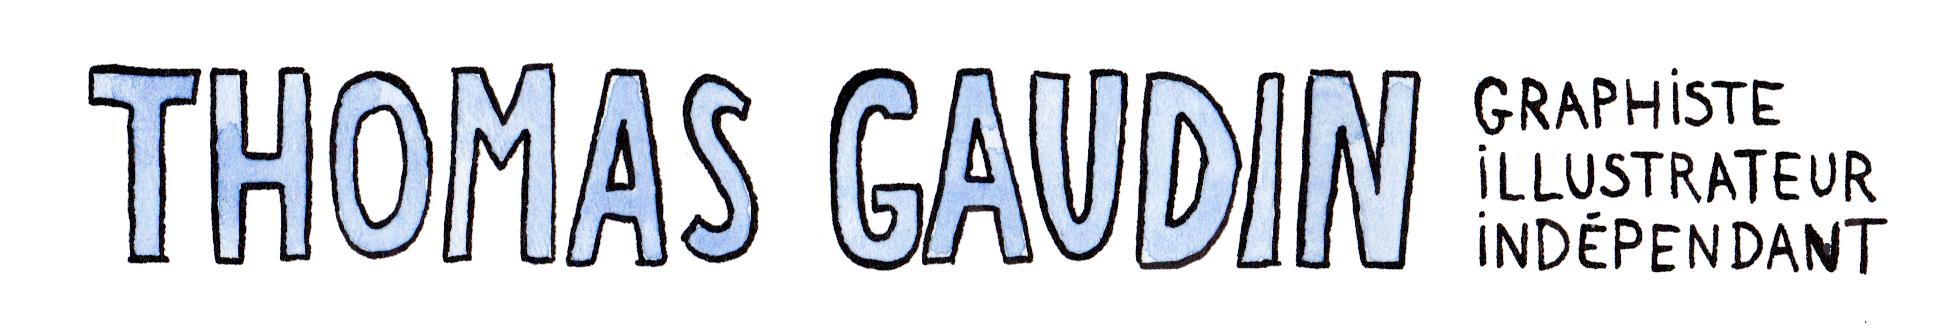 Thomas Gaudin